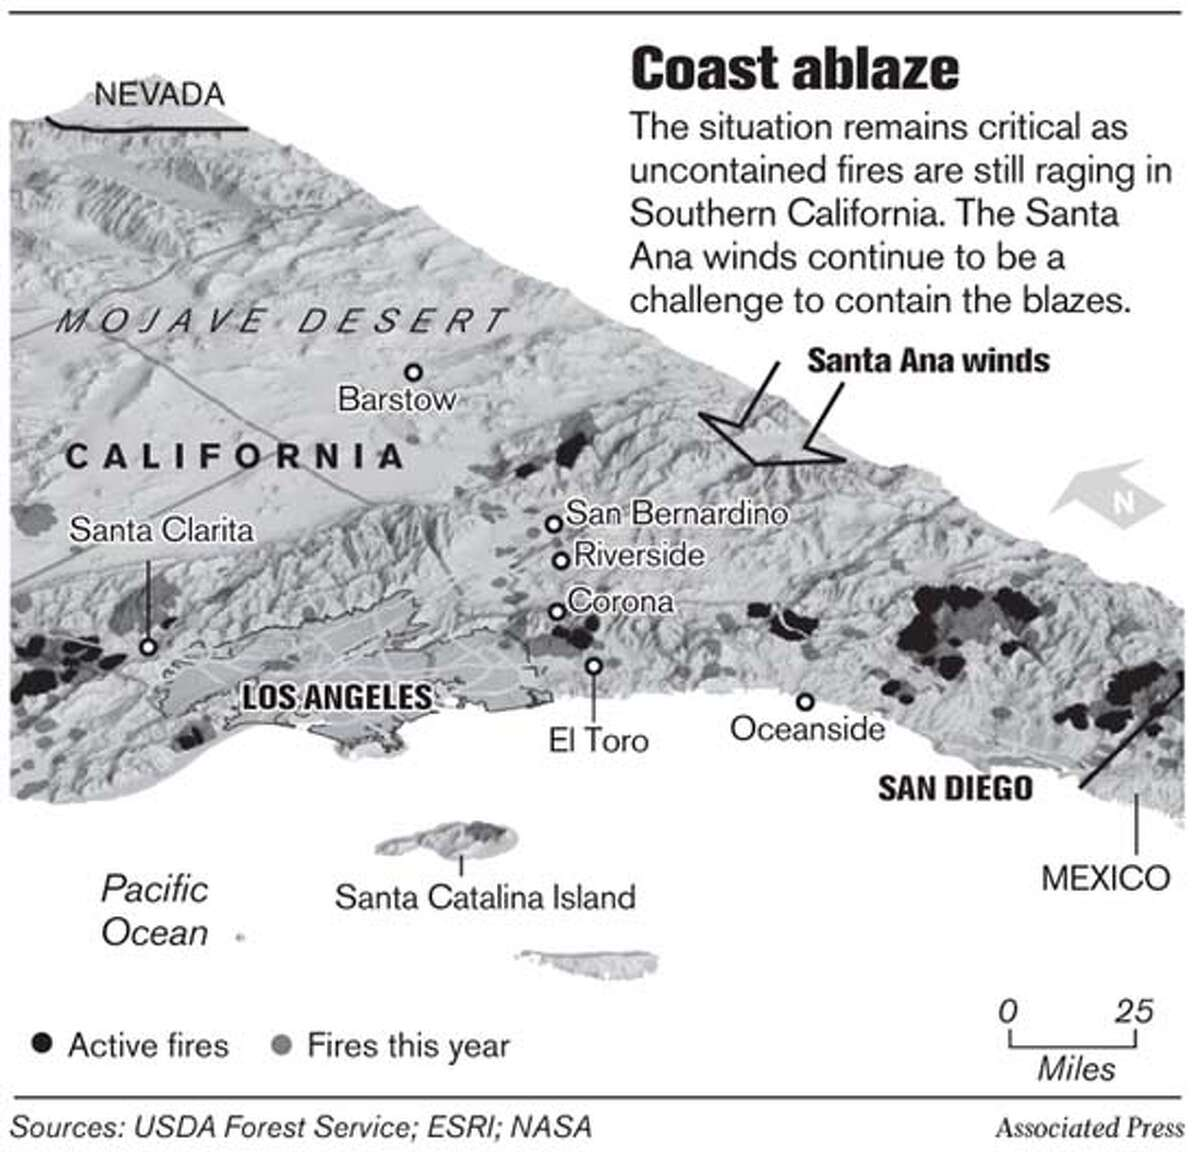 Coast Ablaze. Associated Press Graphic